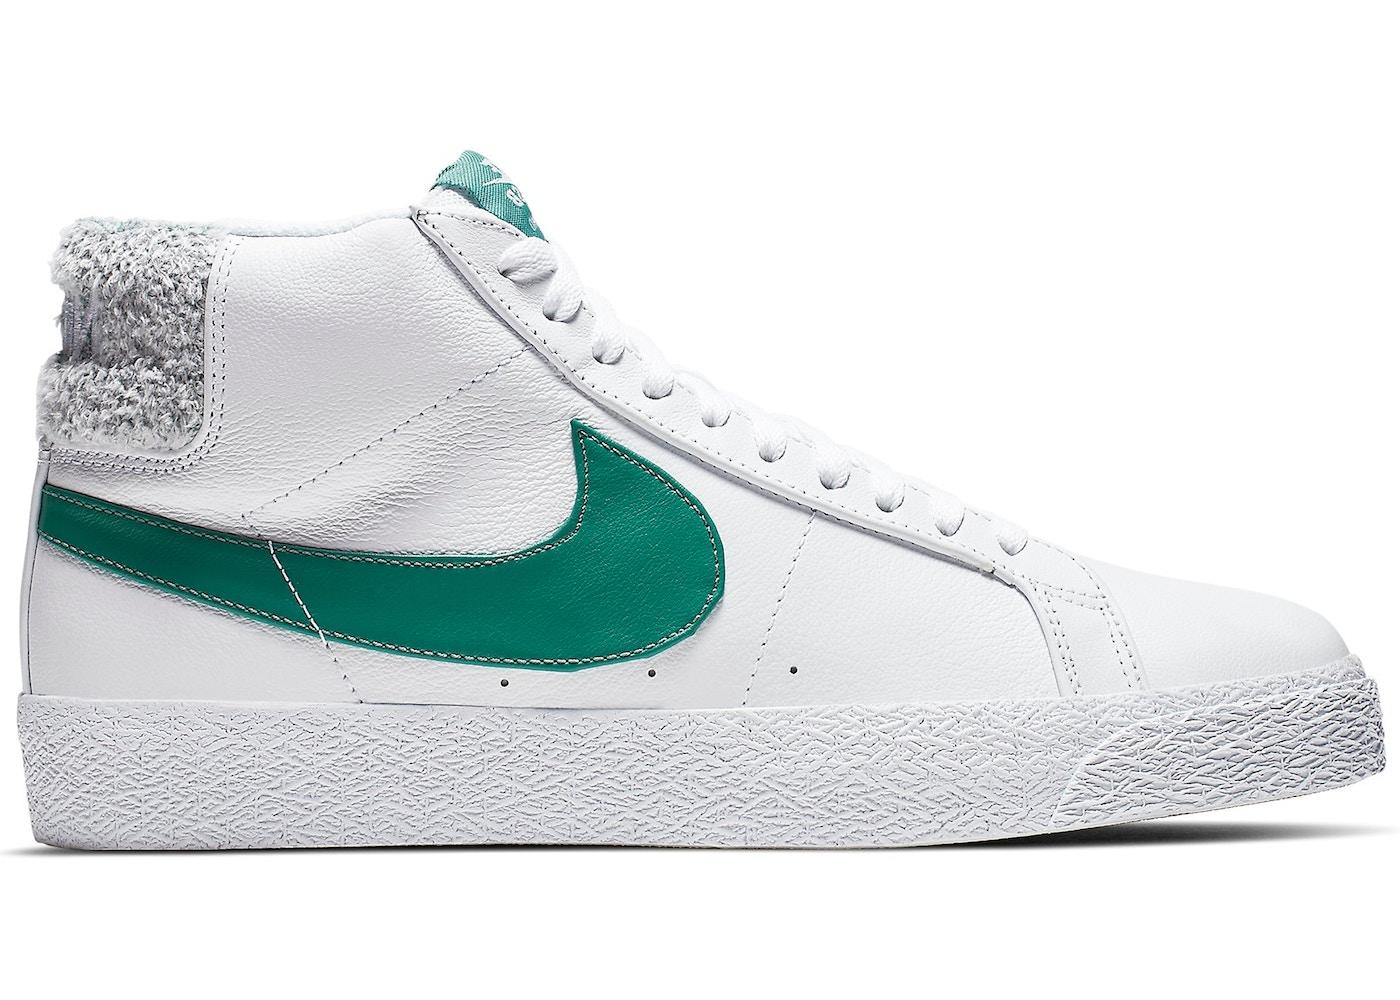 Nike SB Zoom Blazer Mid White Bicoastal